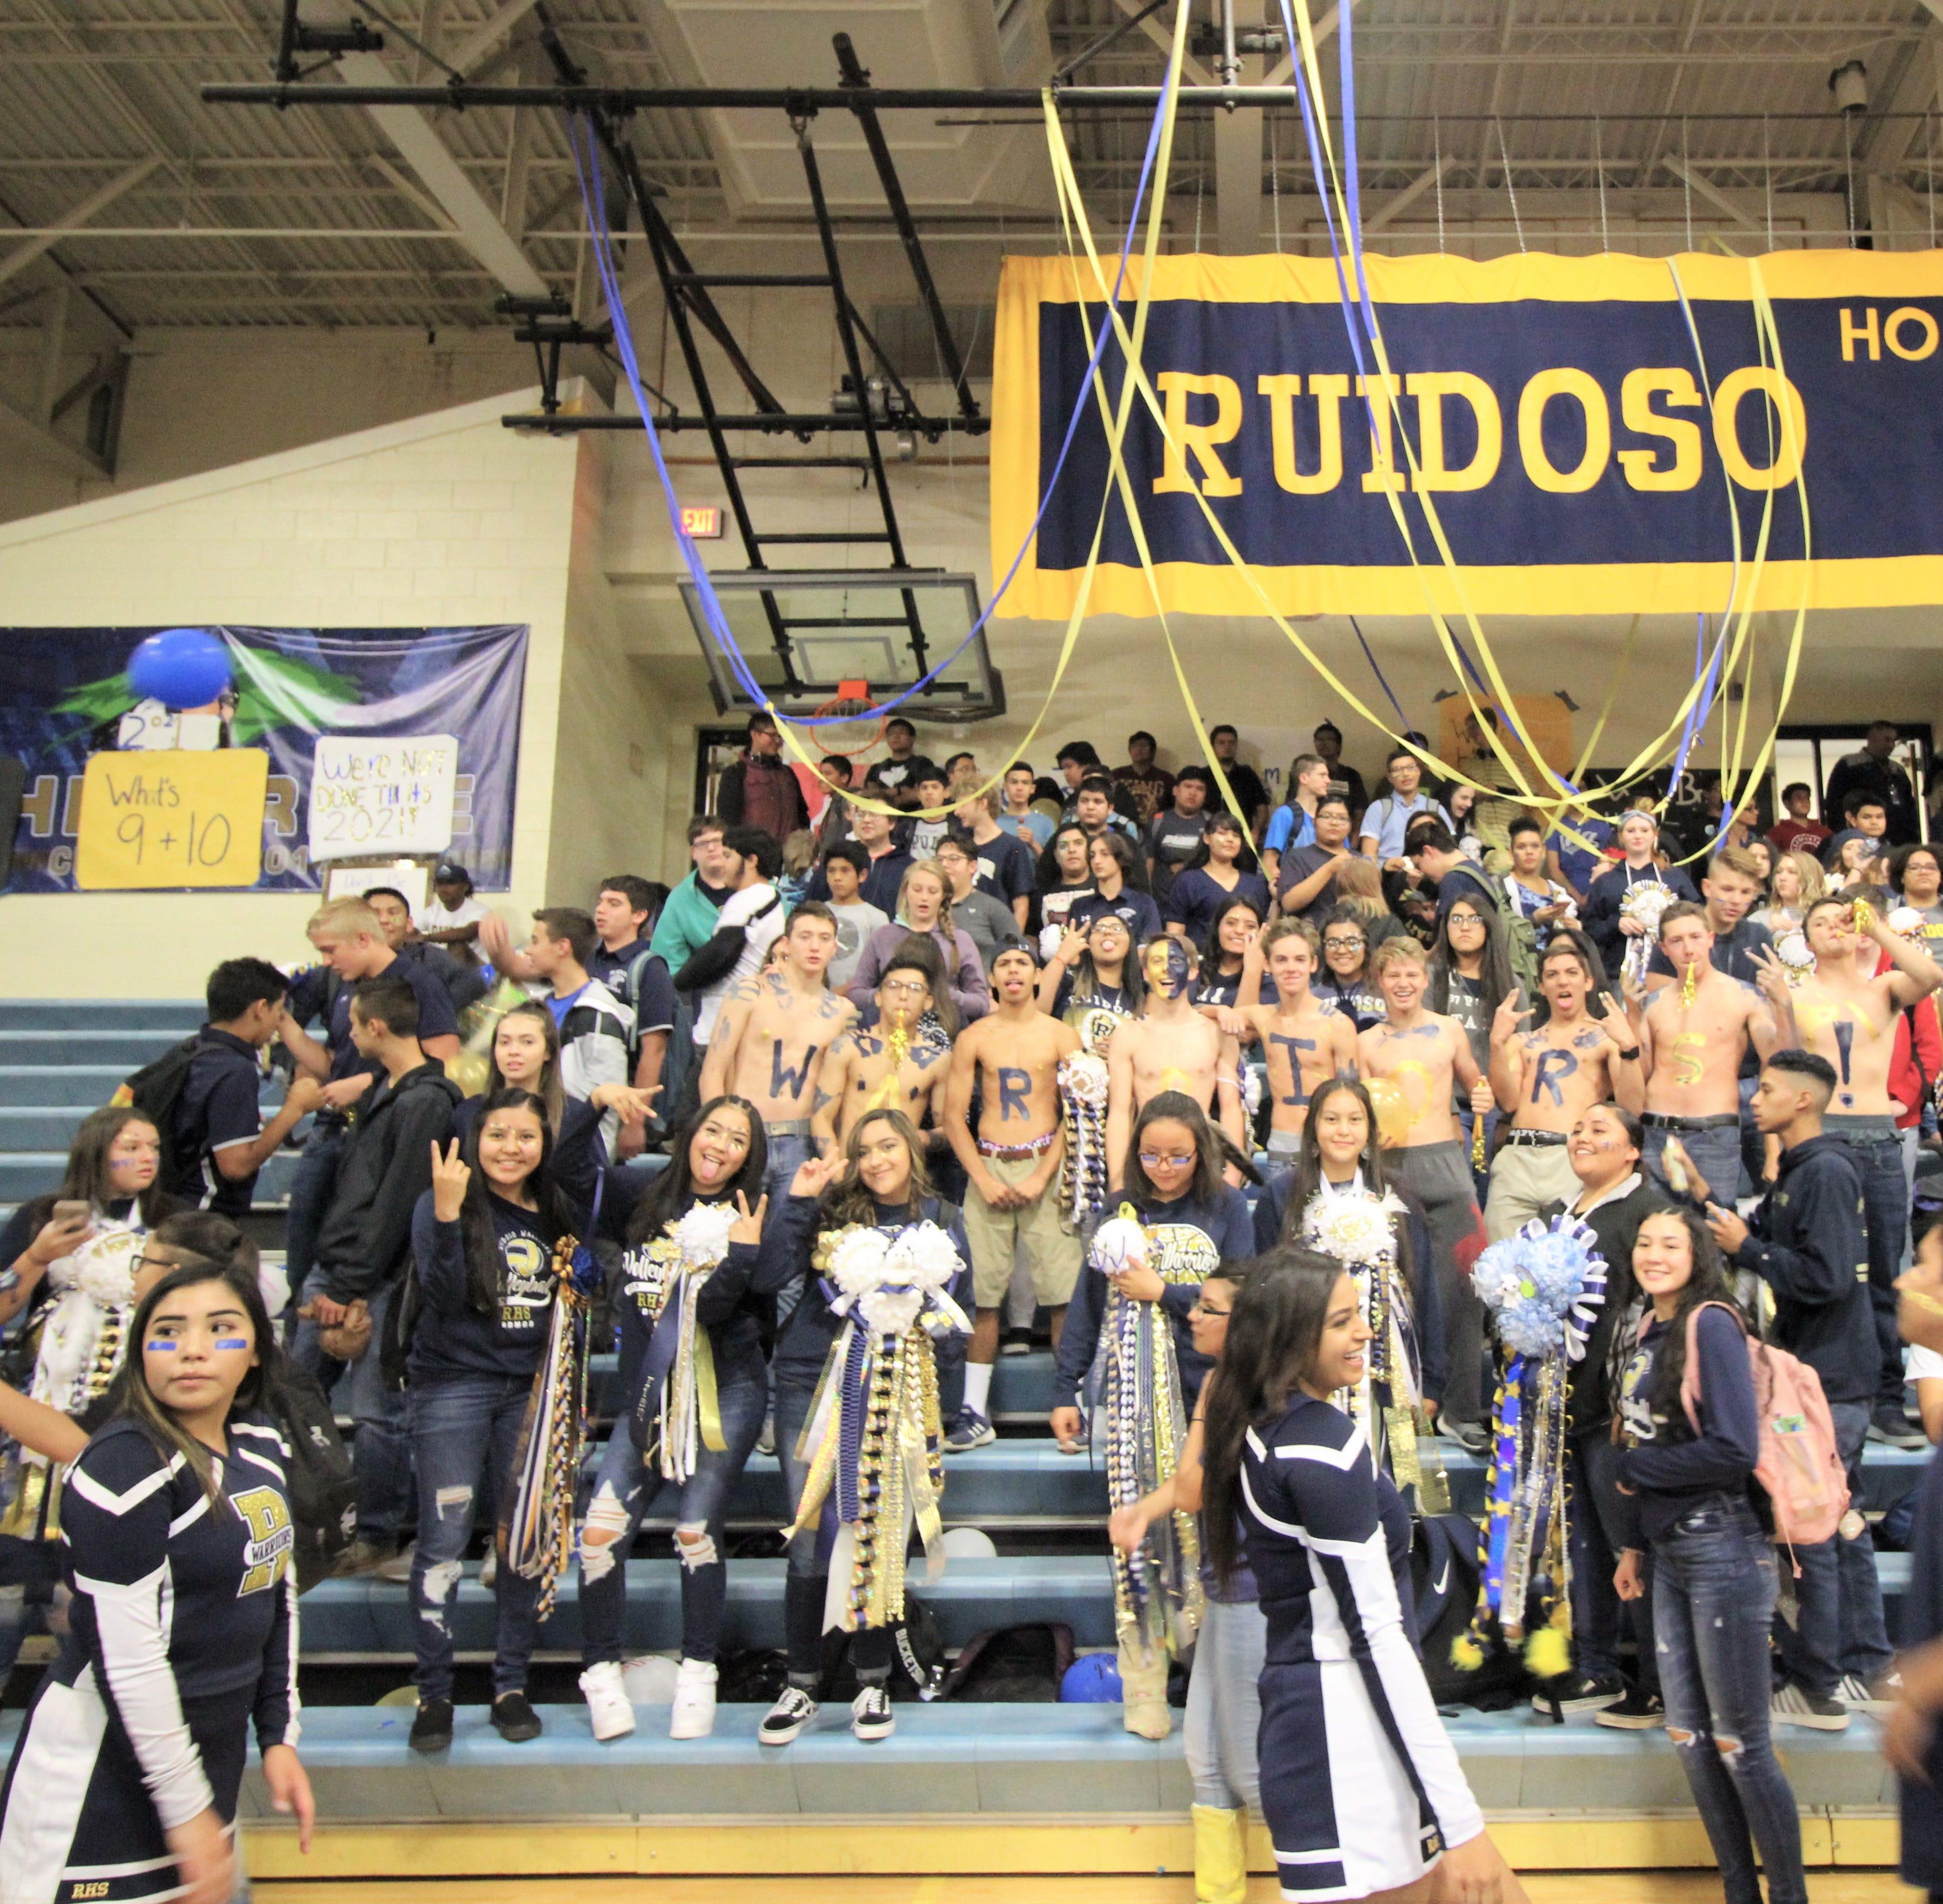 Ruidoso High School 2018 Homecoming pep rally